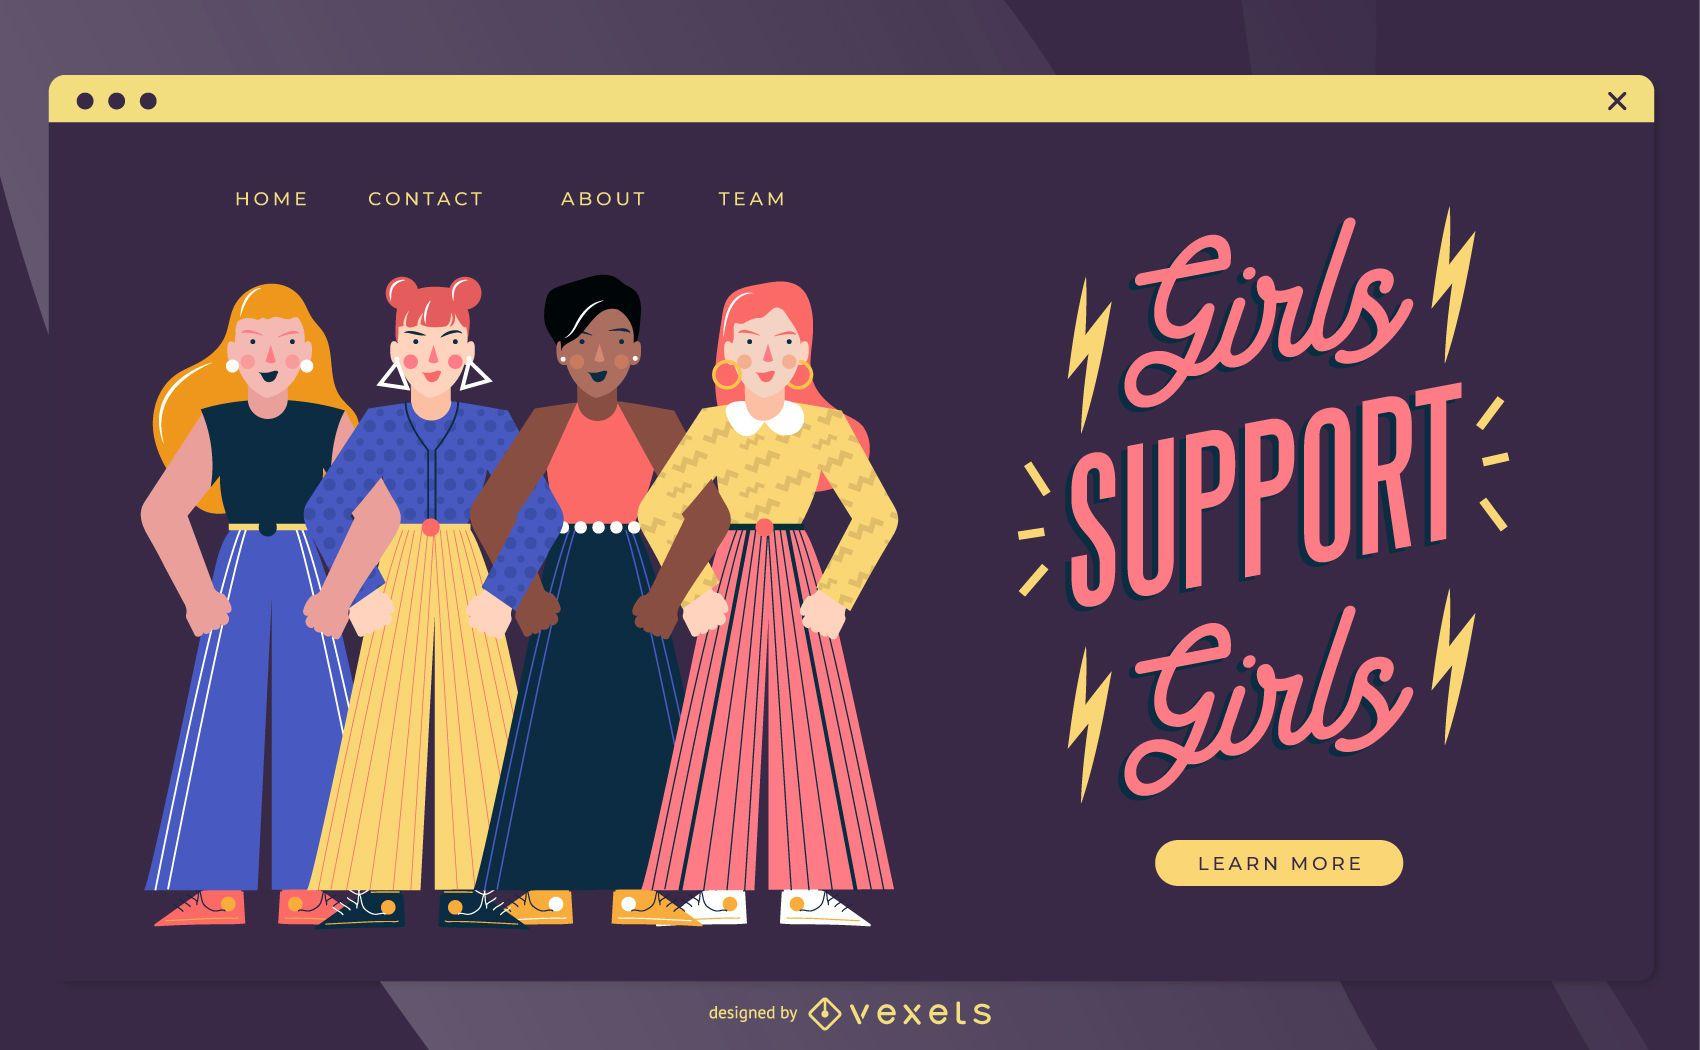 Women's day landing page design